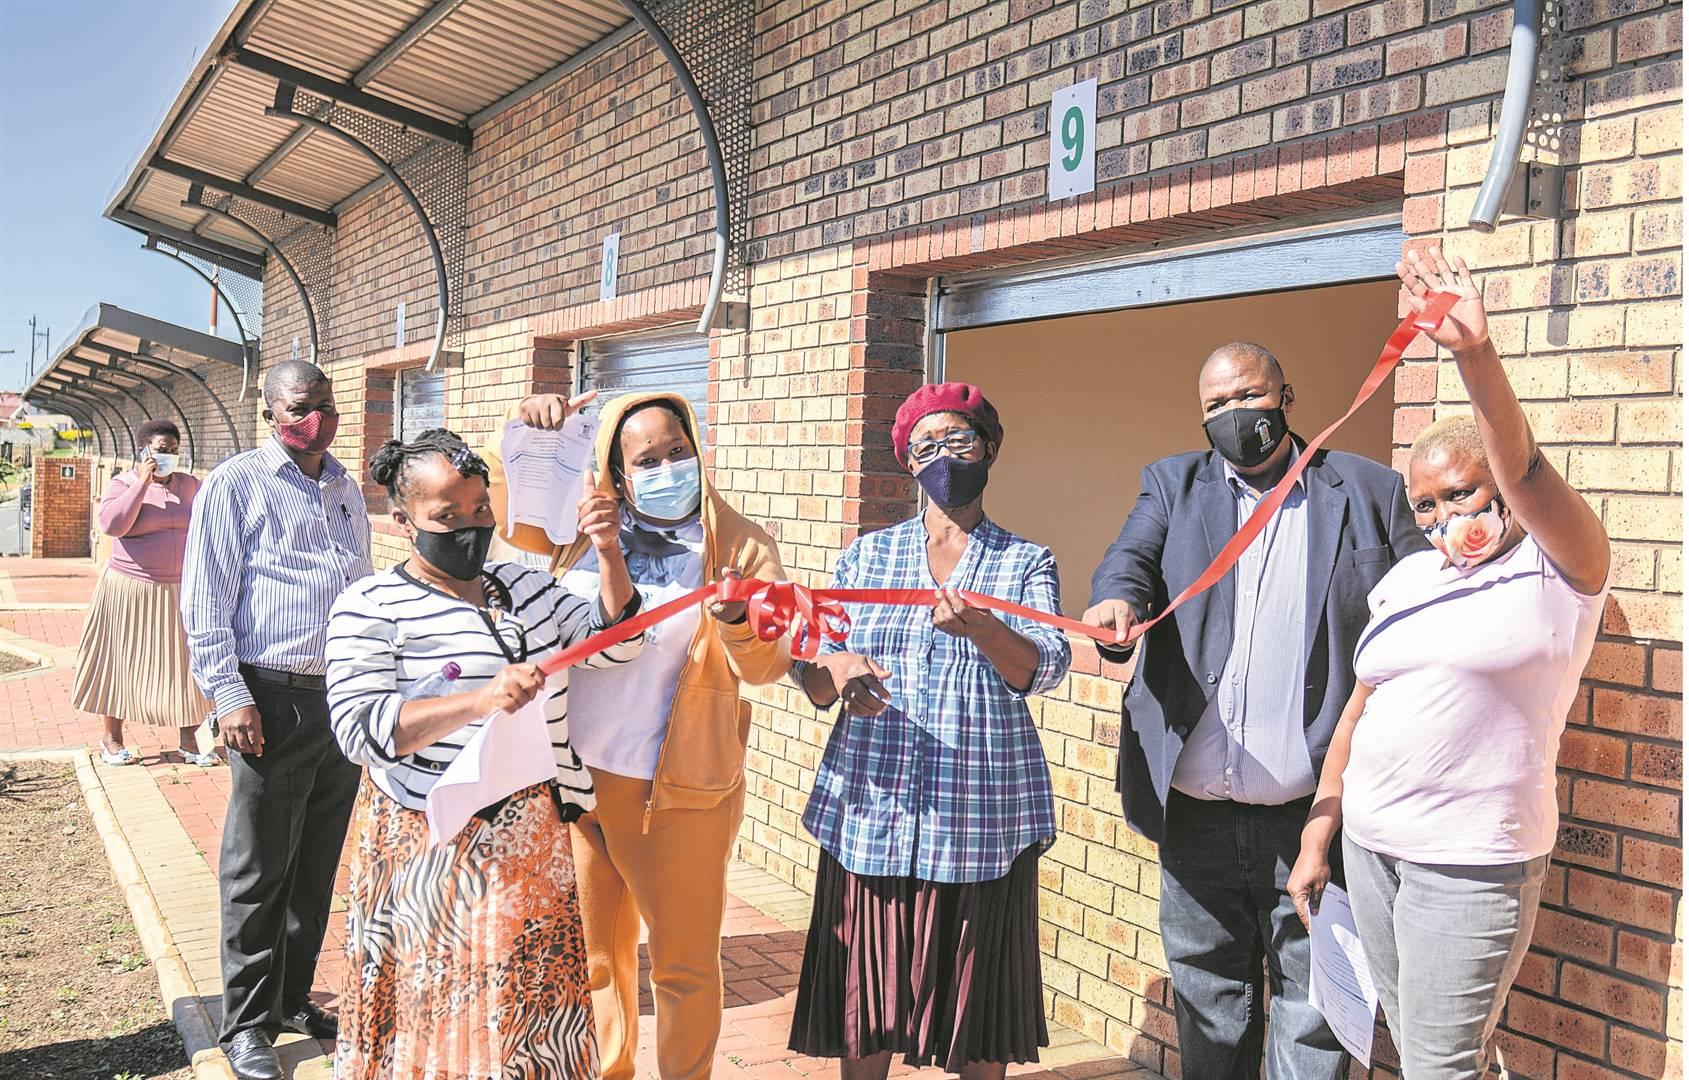 Pictured (from left) are Imbali informal traders, Babalwa Vuzane, Happy Mthembu, Thandiwe Ngcobo, Makhosi Mngidi and Zodwa Mbele with Msunduzi mayor Mzimkhulu Thebolla and ward councillor Xolani Ngongoma in Imbali on Monday.